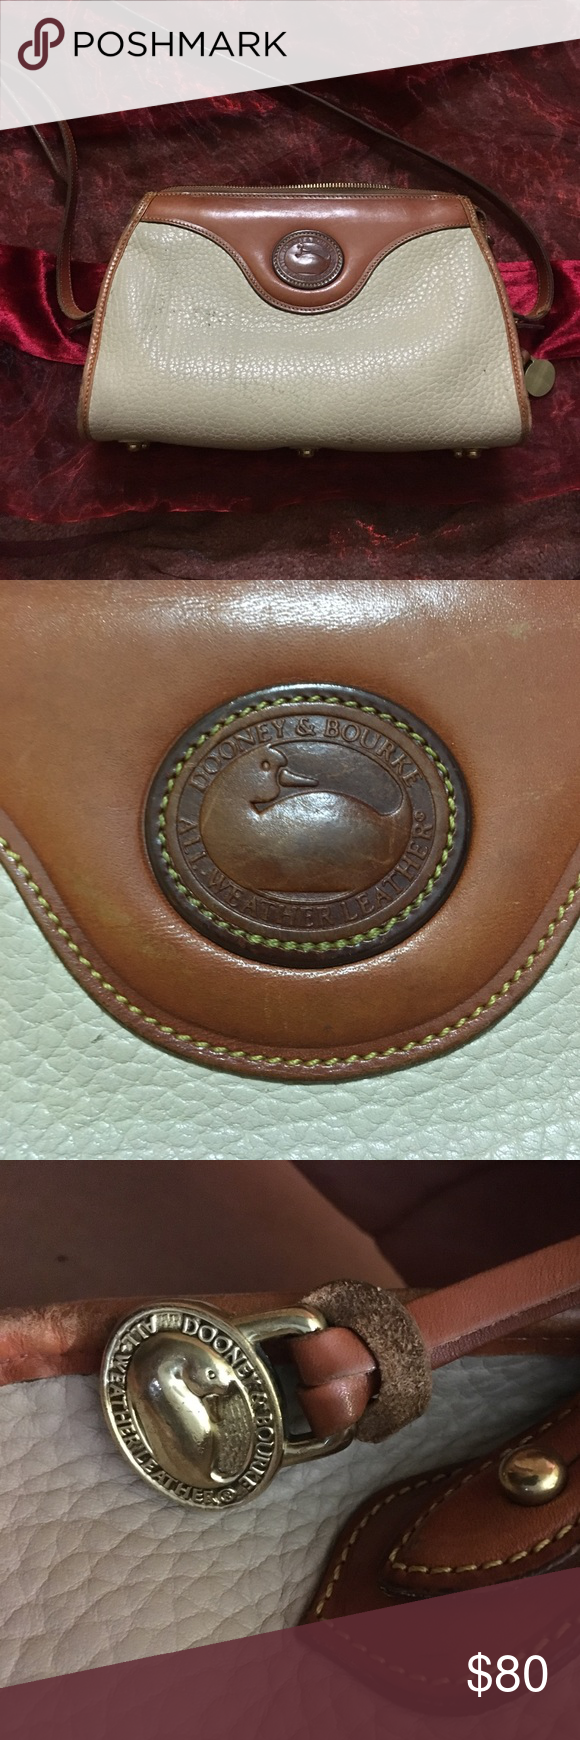 Dooney & Bourke Vintage Purse ! Vintage Dooney & Bourke Handbag. Medium Size. Refurbished.💋 Dooney & Bourke Bags Shoulder Bags